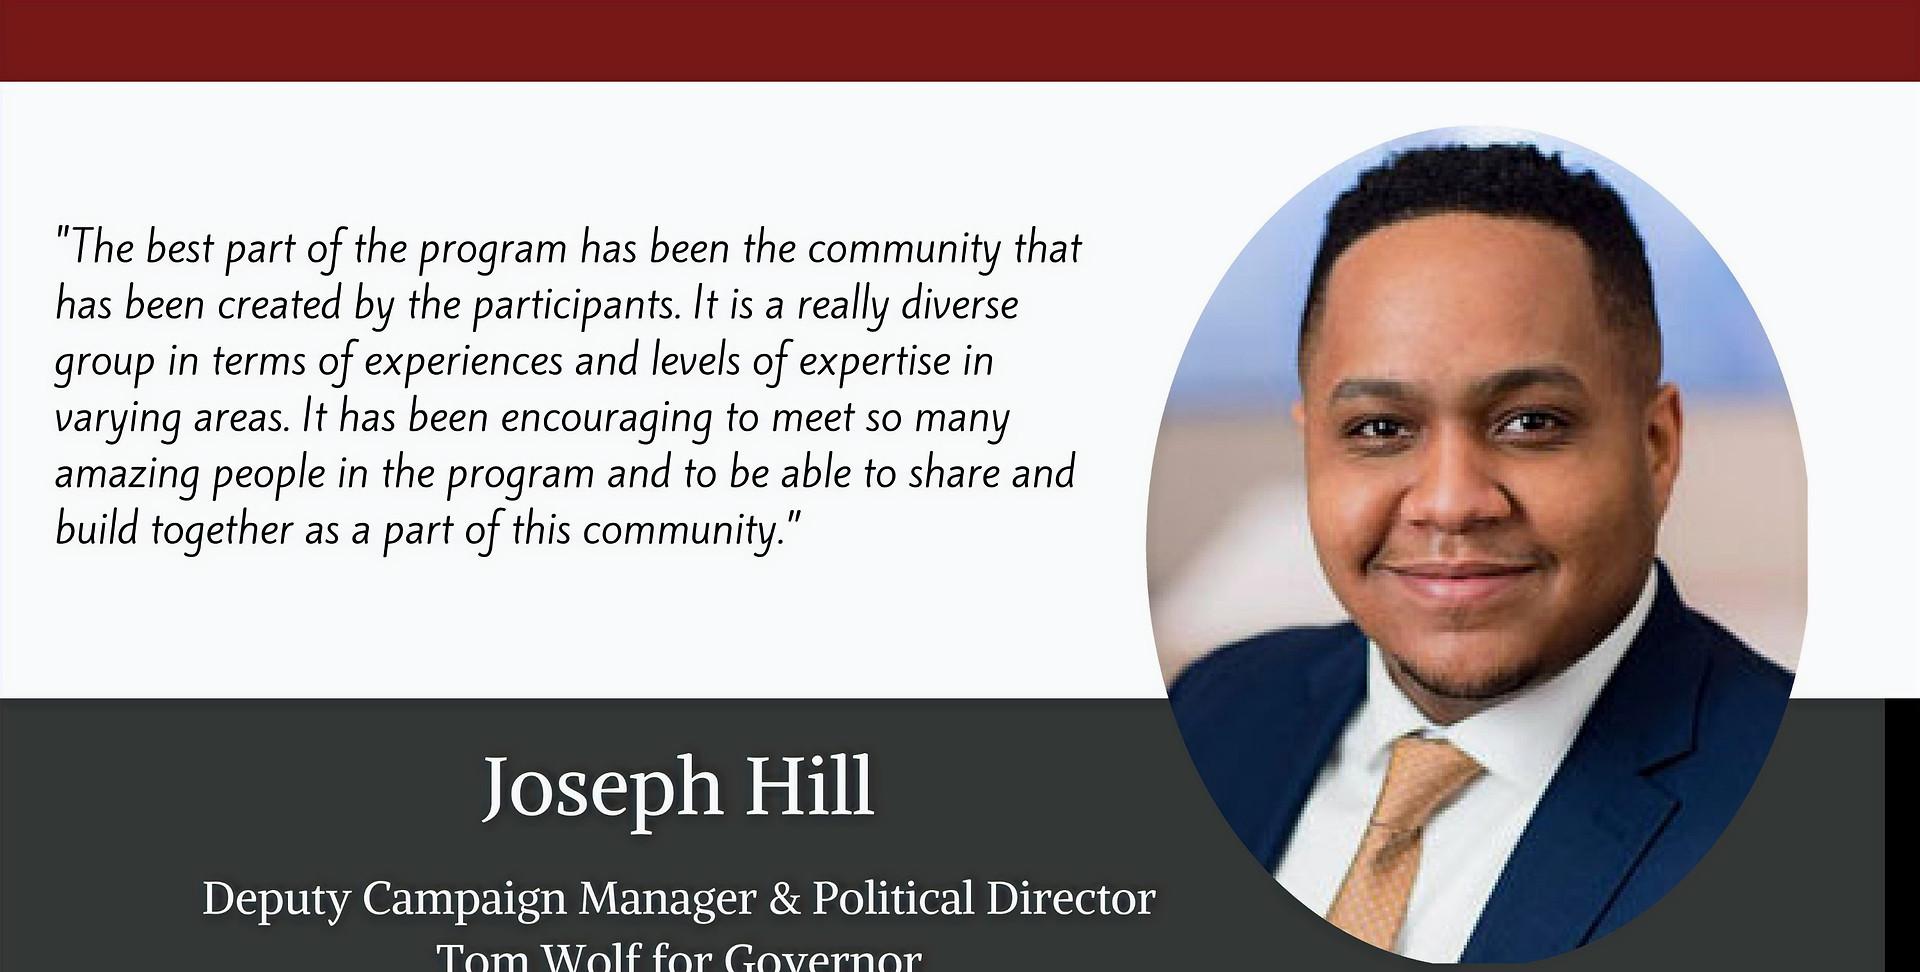 Joseph Hill